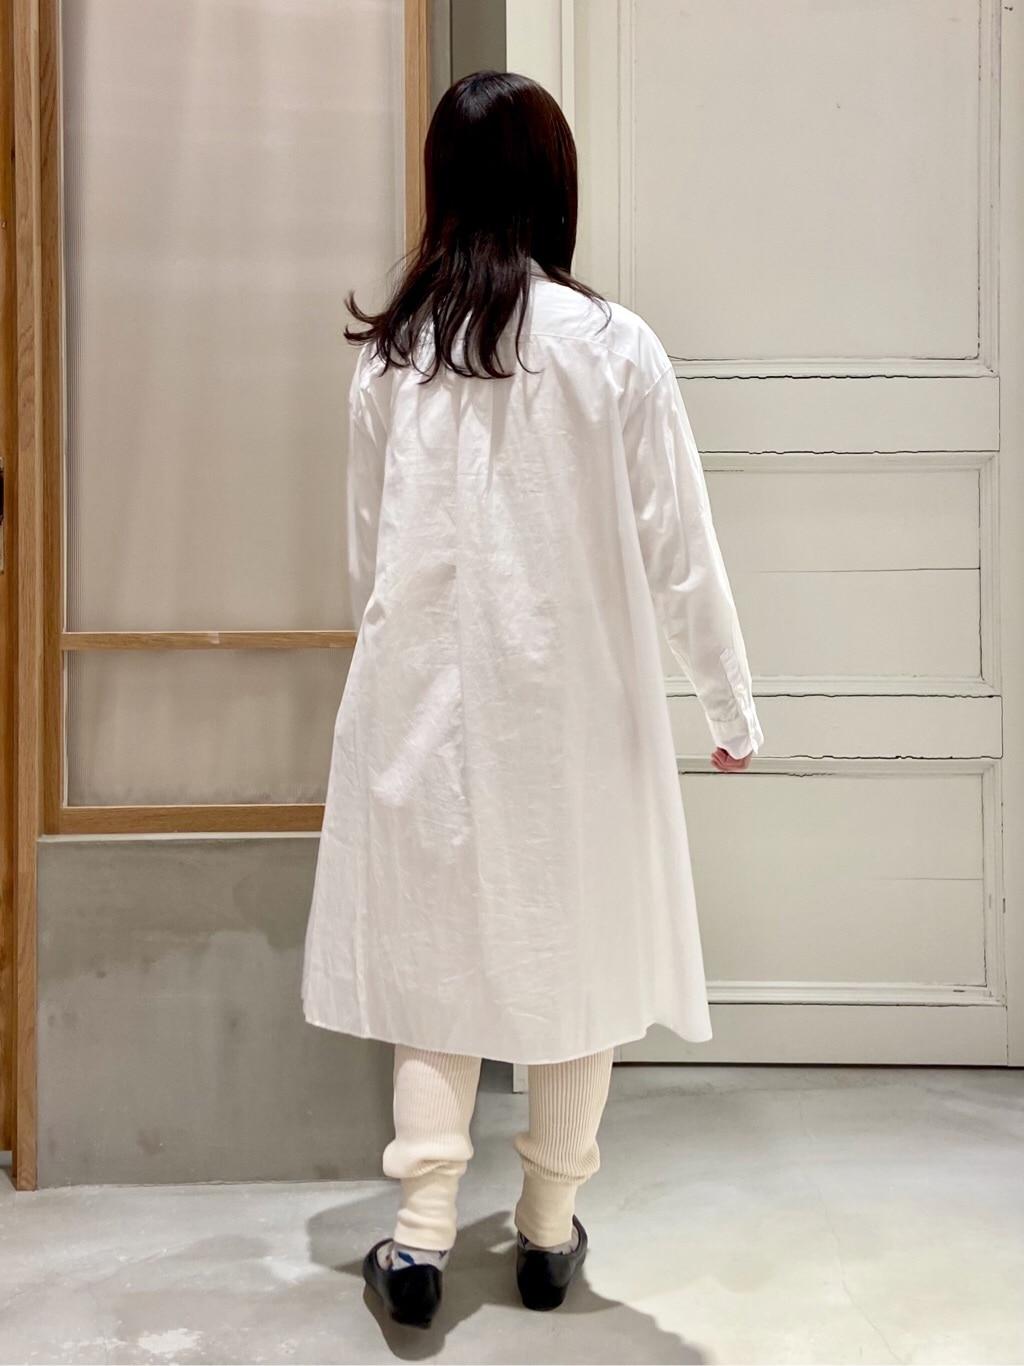 bulle de savon 渋谷スクランブルスクエア 身長:153cm 2021.01.22